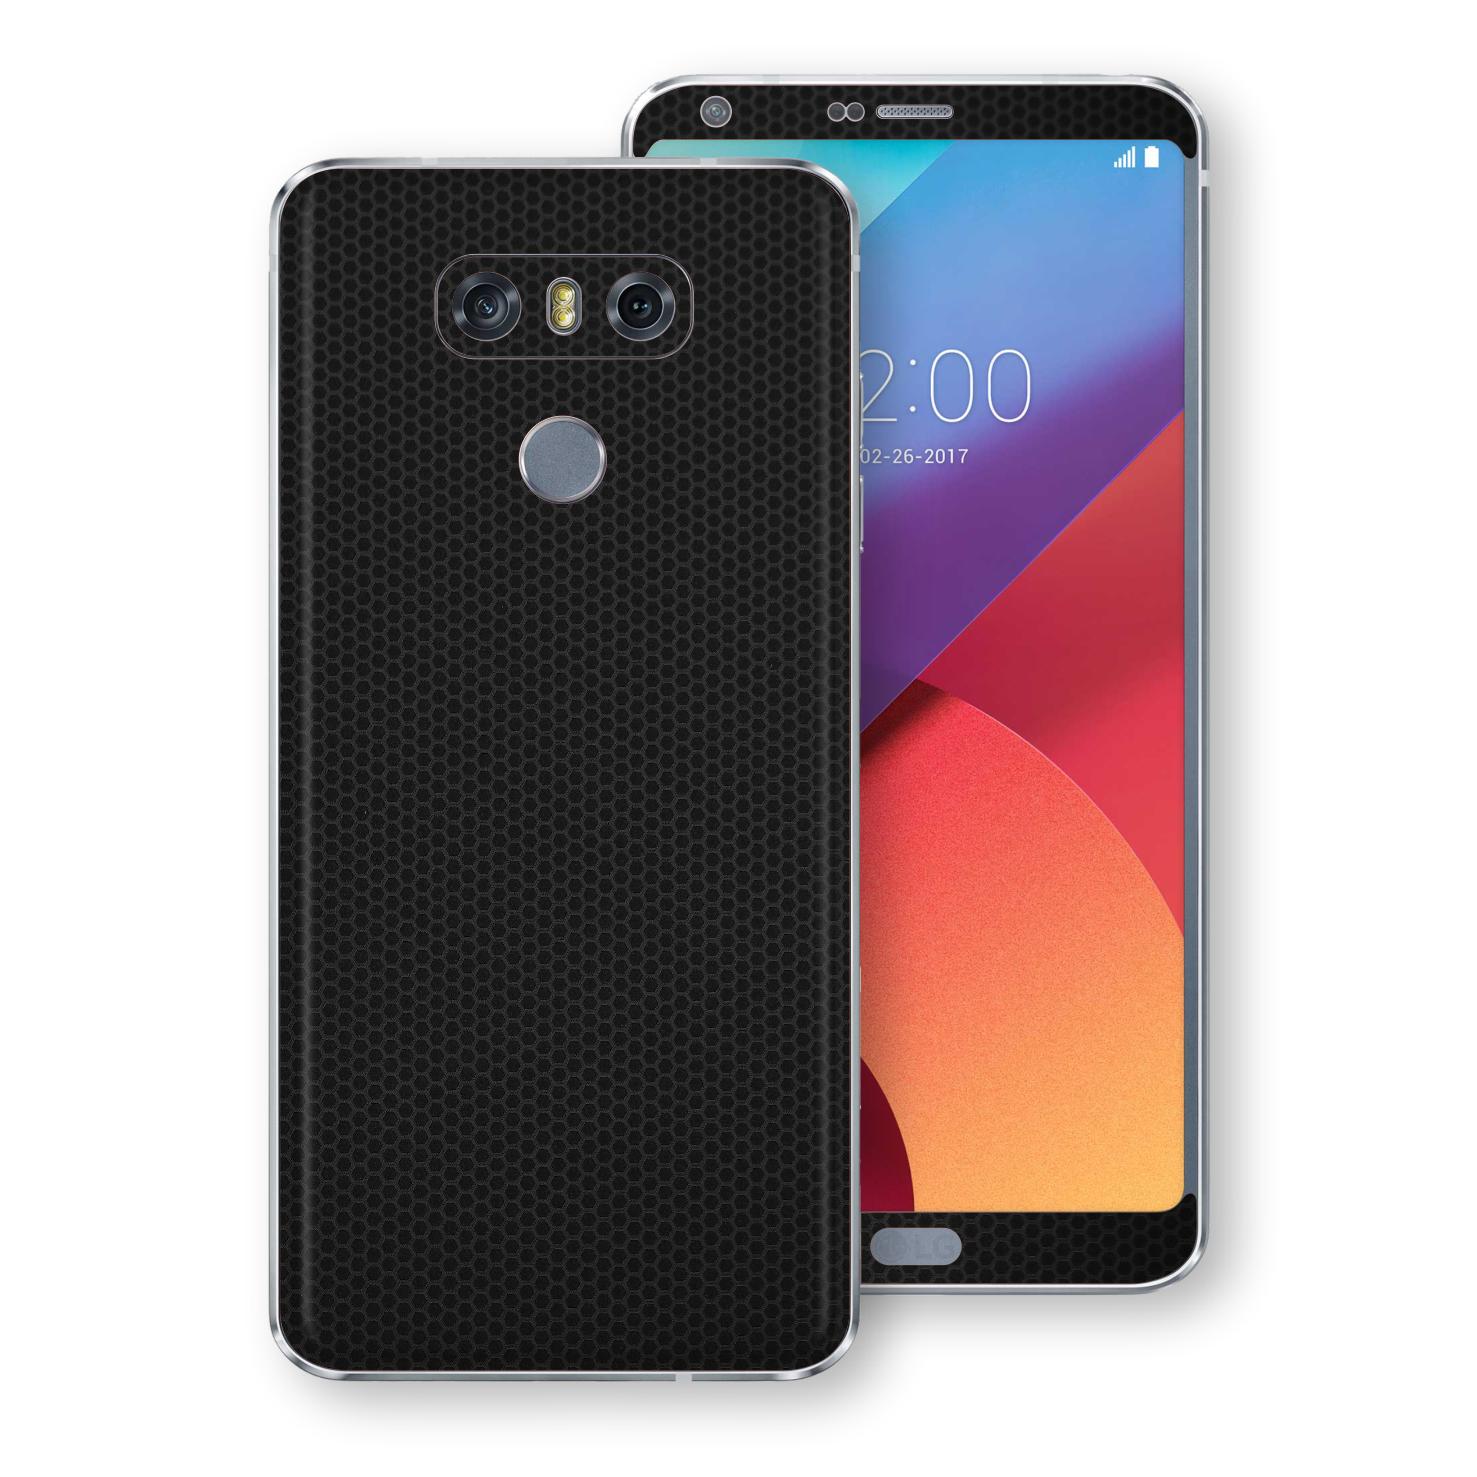 EasySkinz LG G6 LUXURIA Black MATRIX Skin